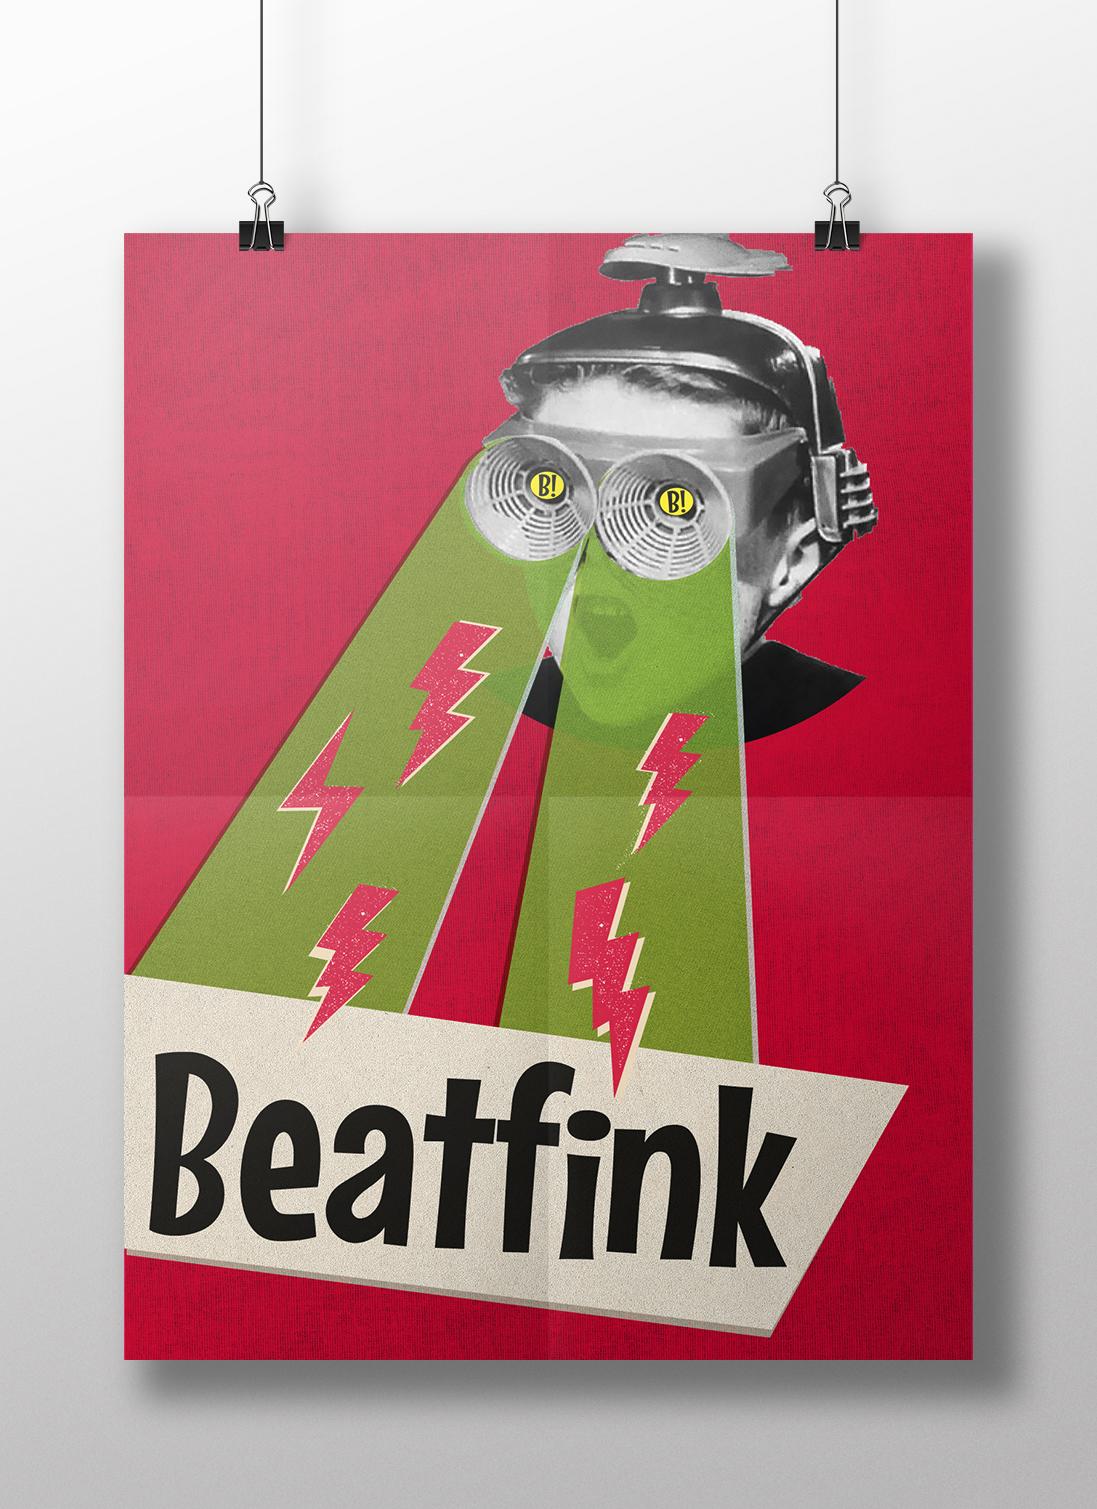 Beatfink poster_mockup.jpg